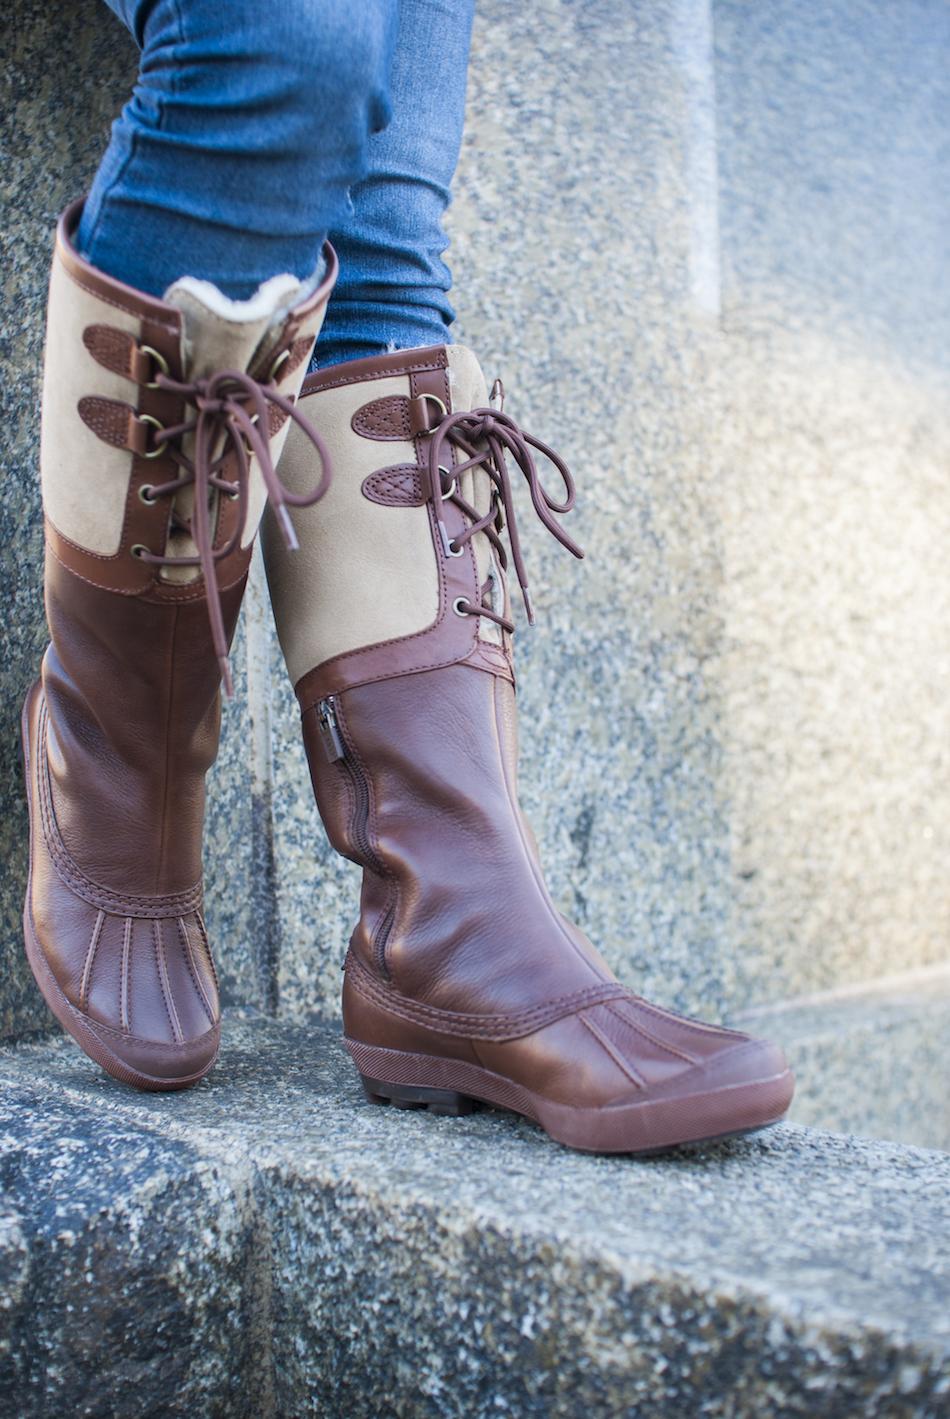 UGG Australia's waterproof leather duck boot for women